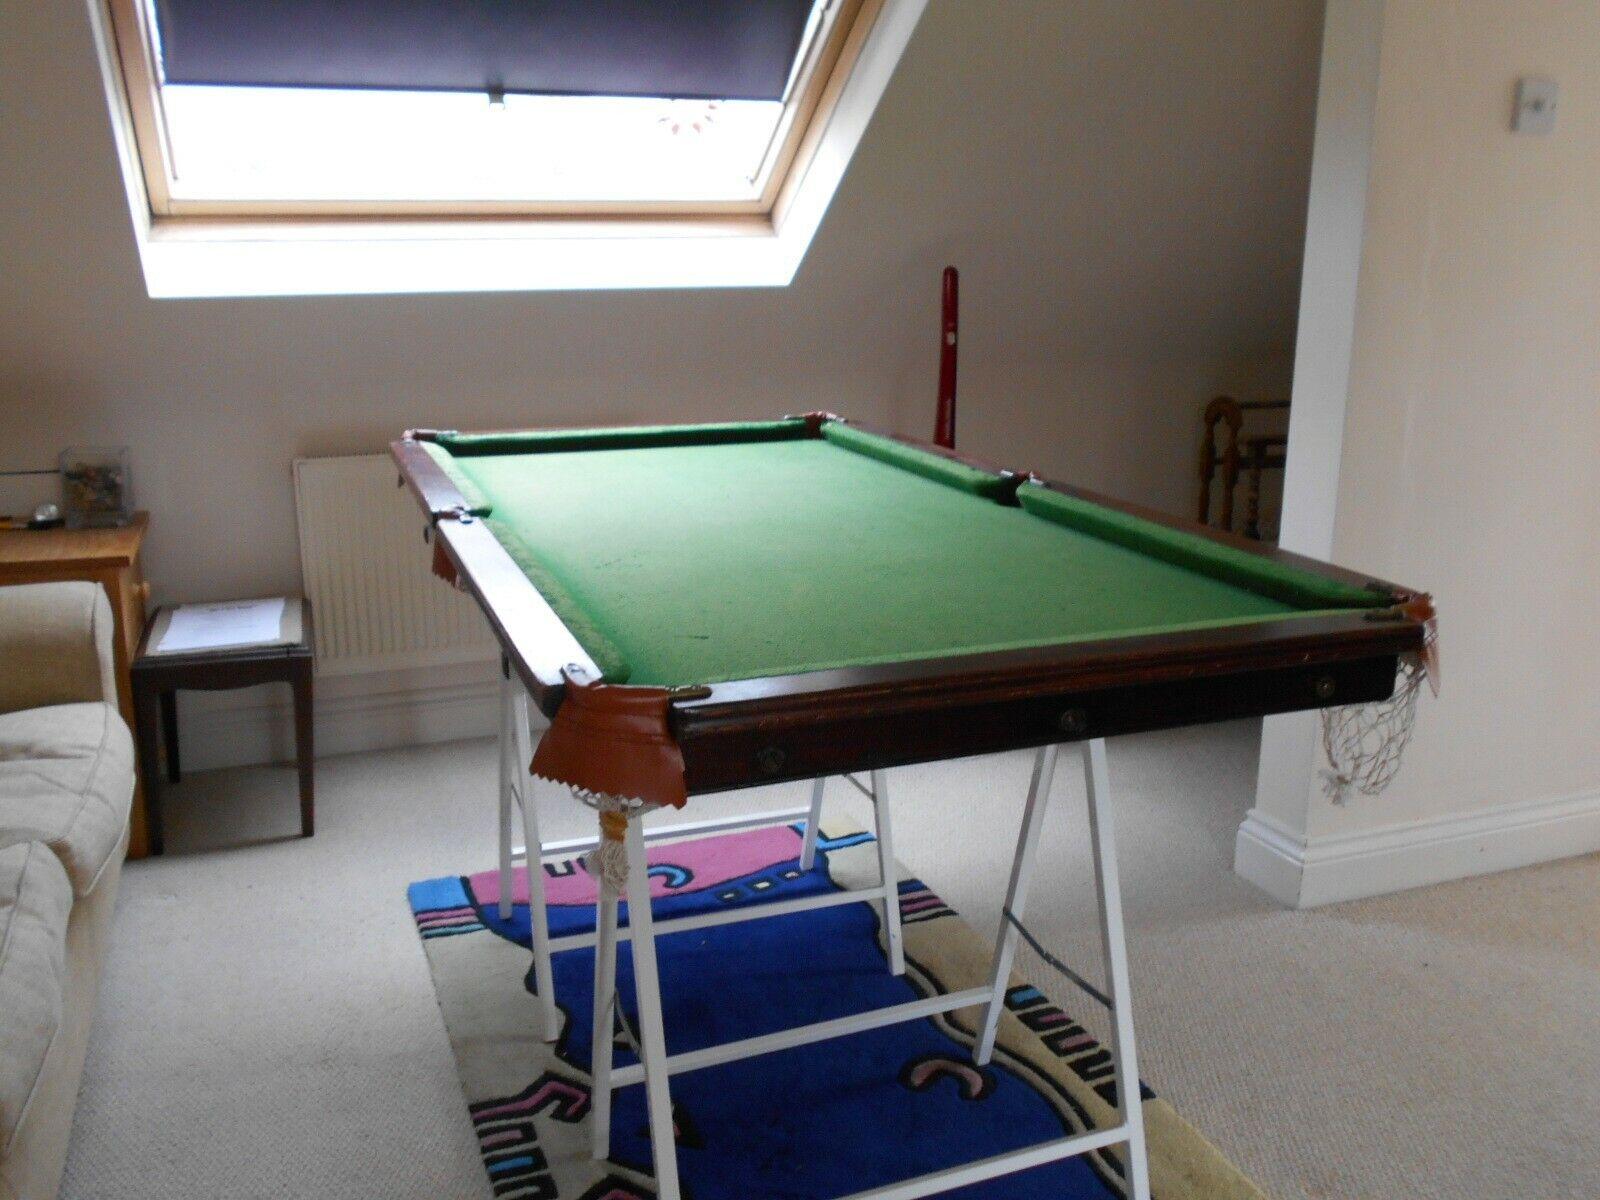 Vintage Riley tabletop snooker table5'5 x 2'10